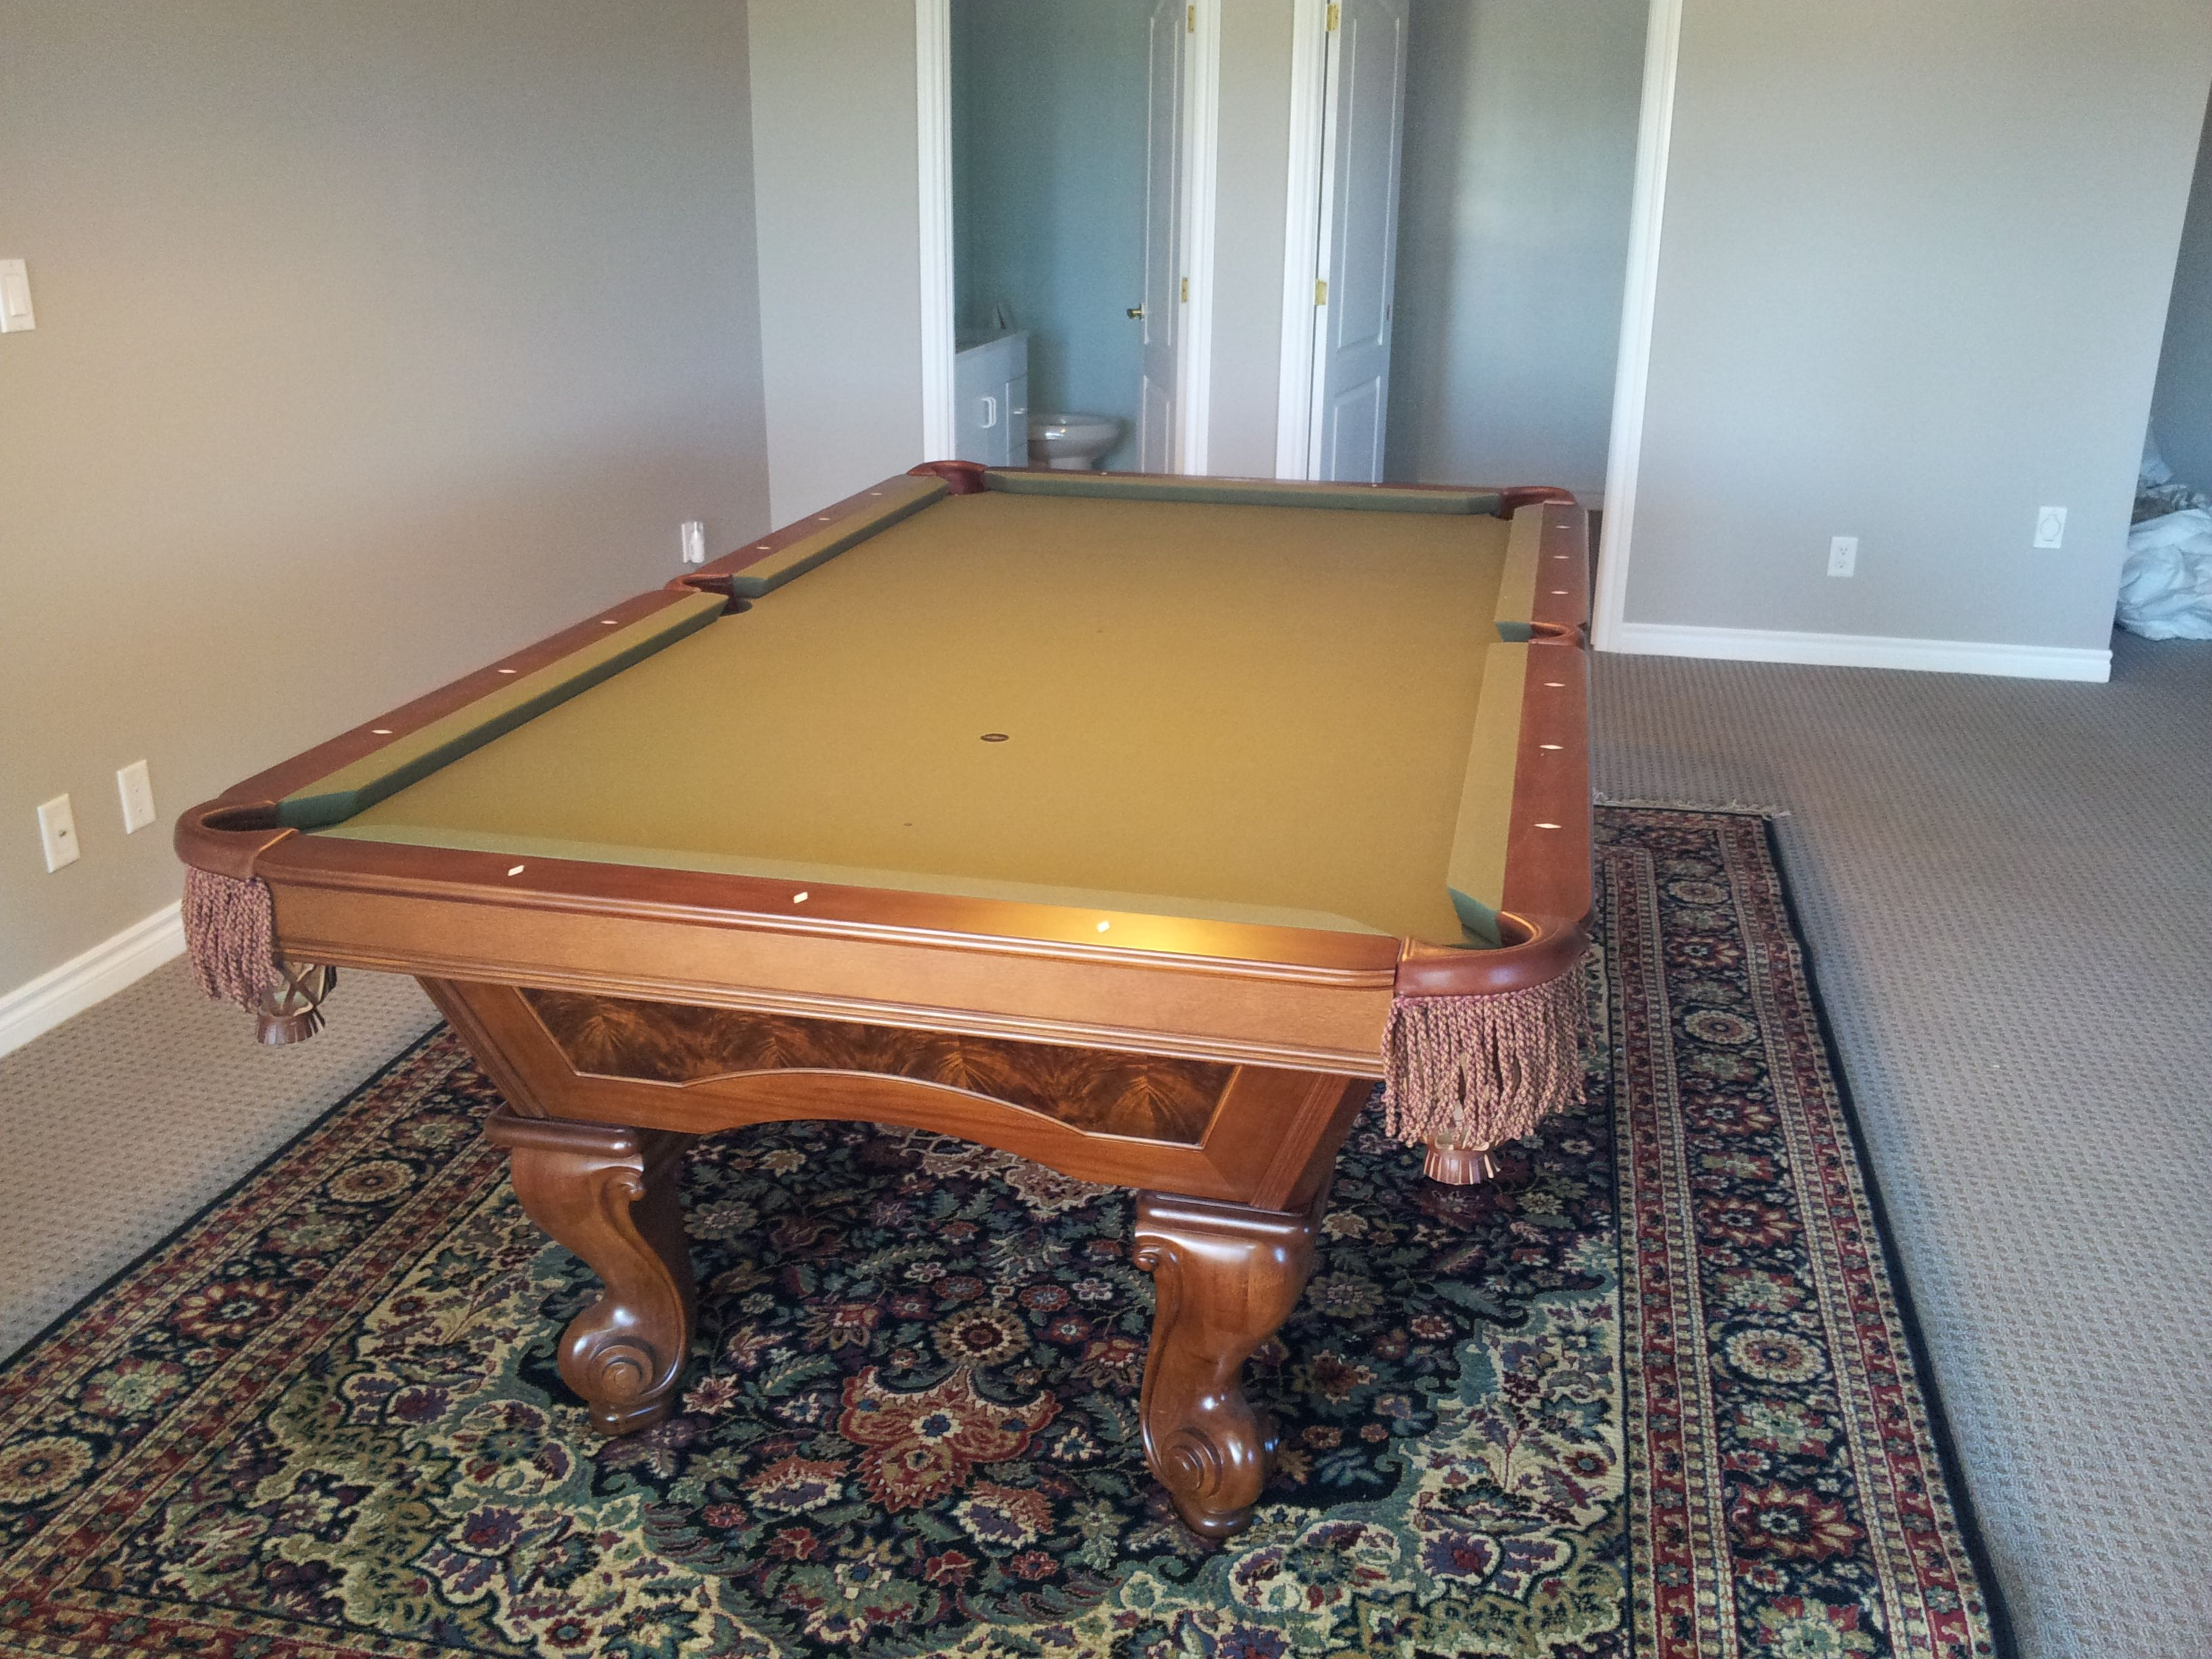 Brunswick Danbury Pool Table In Chestnut Finish The Customer - Dismantle pool table